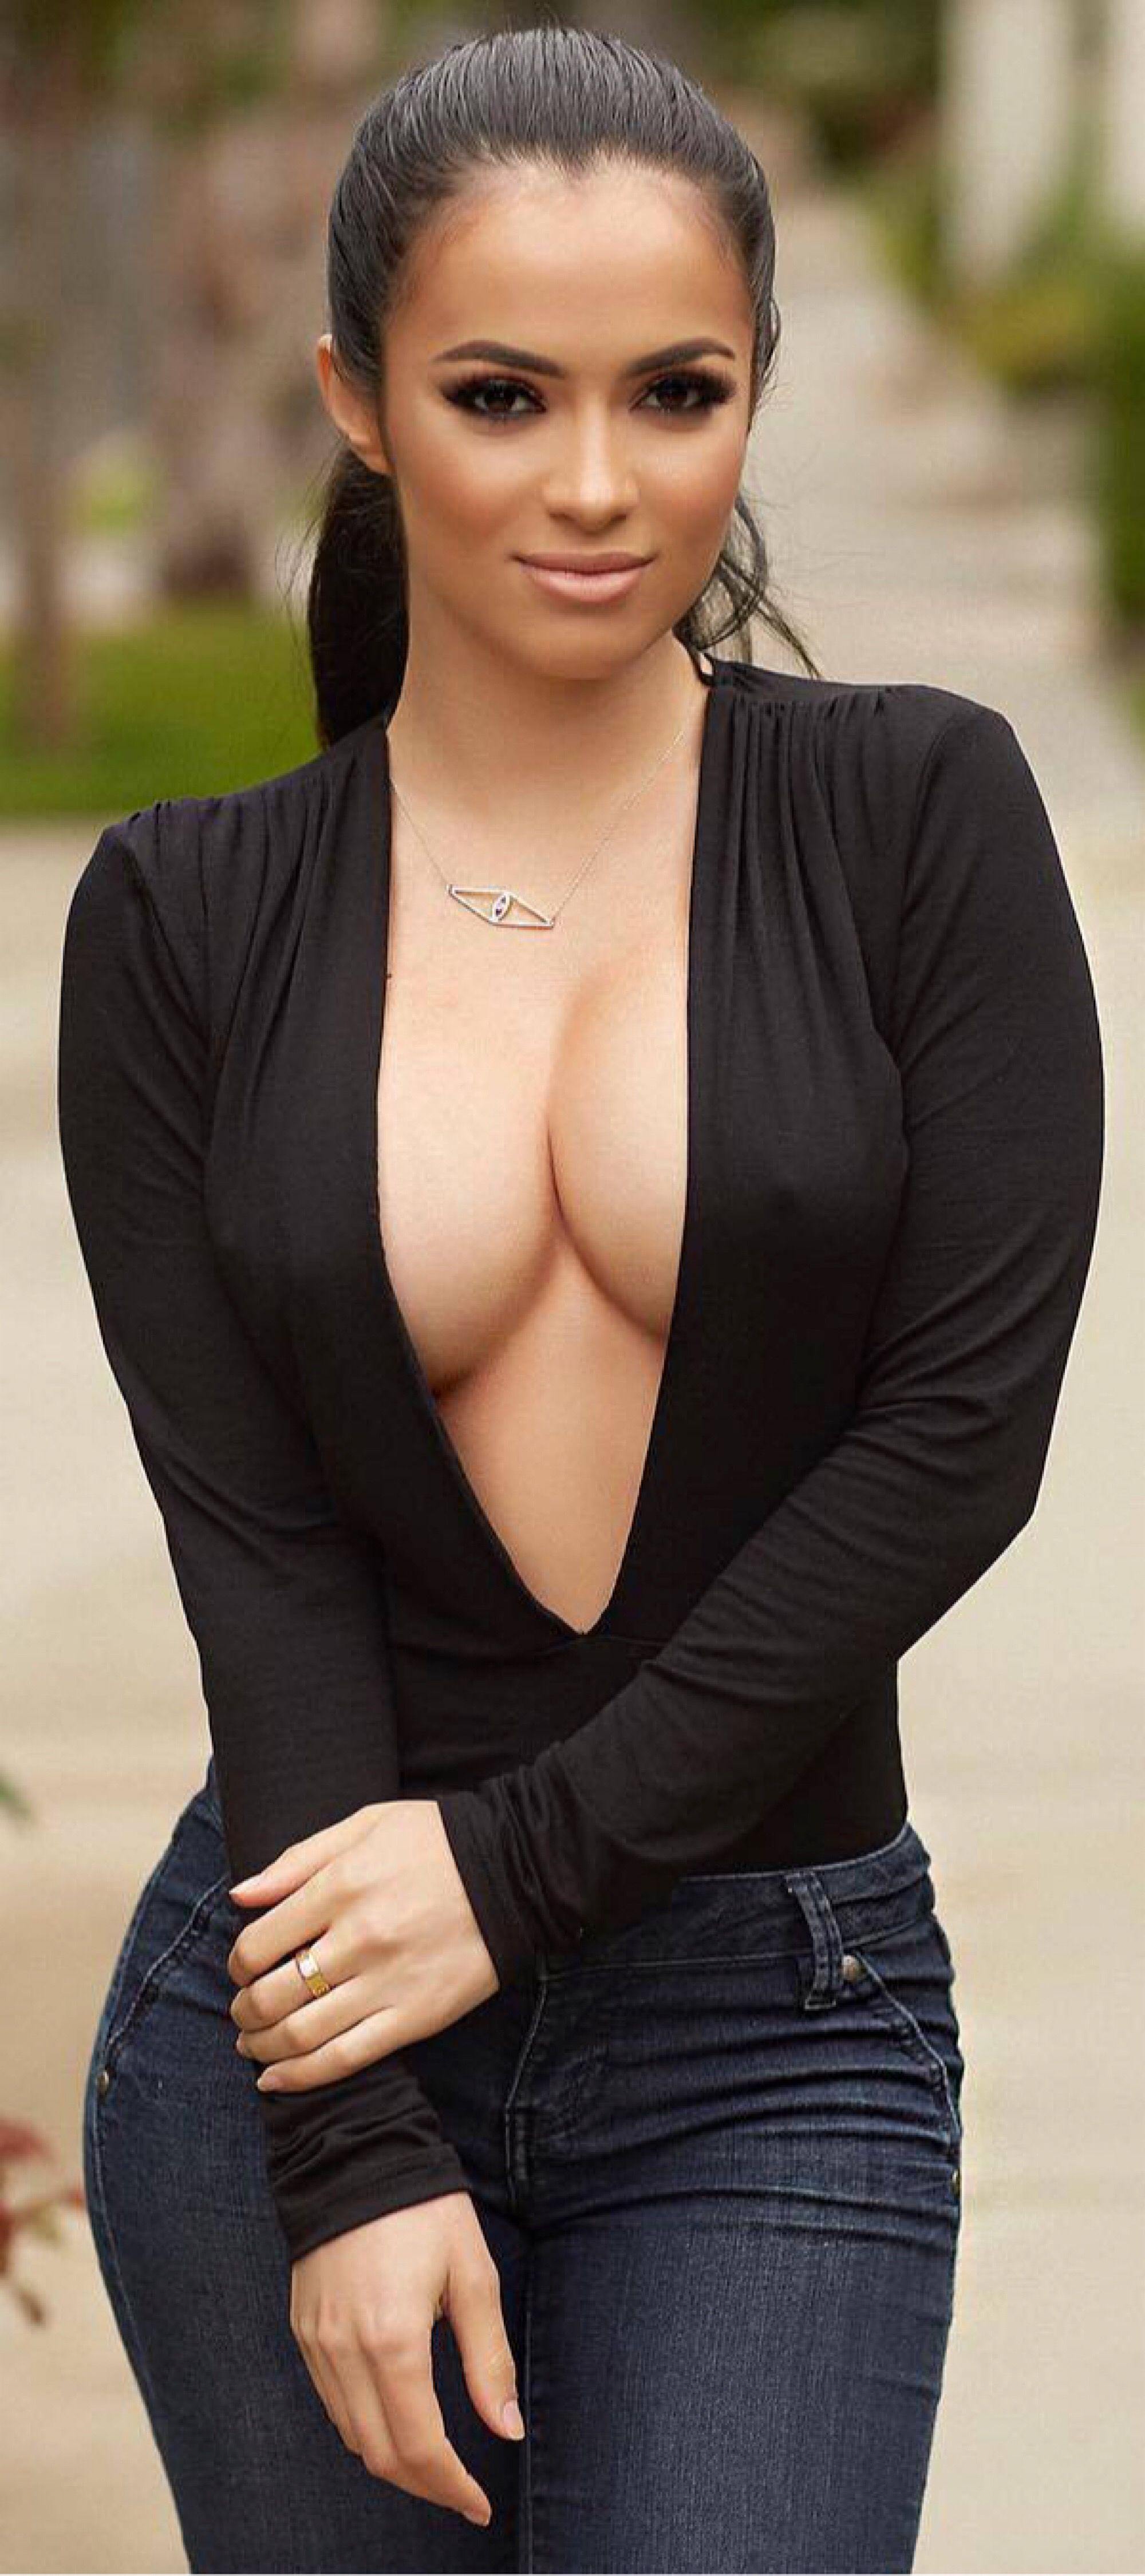 pinshreela tambe on beautiful women | pinterest | boobs, girls